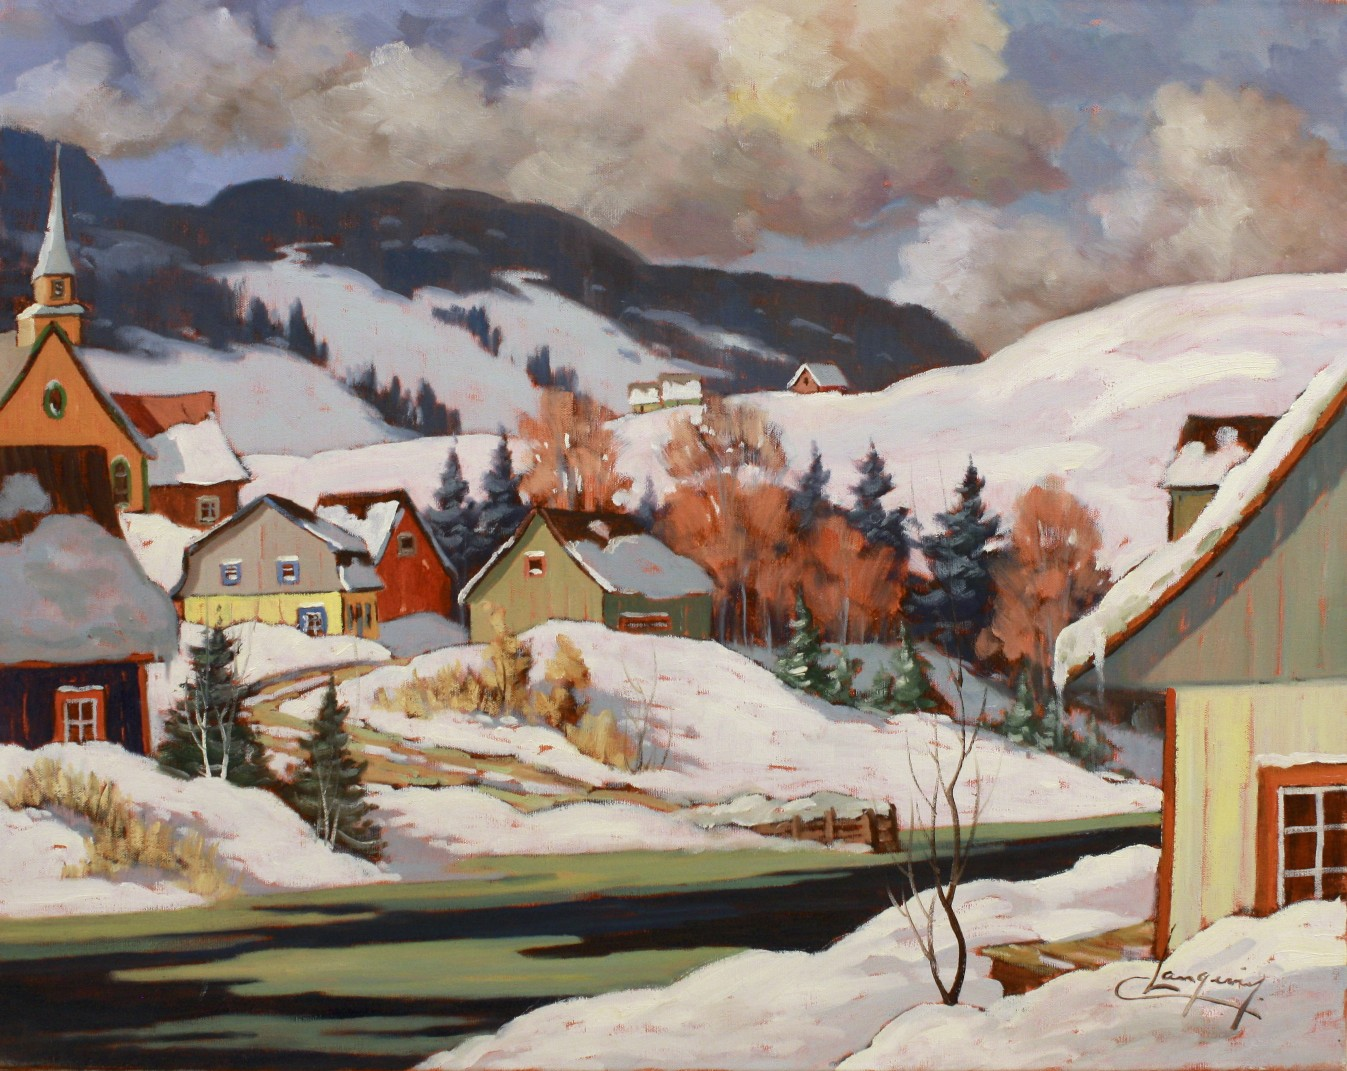 Journee de Fevrier  24 x 30  Oil on Canvas  SOLD